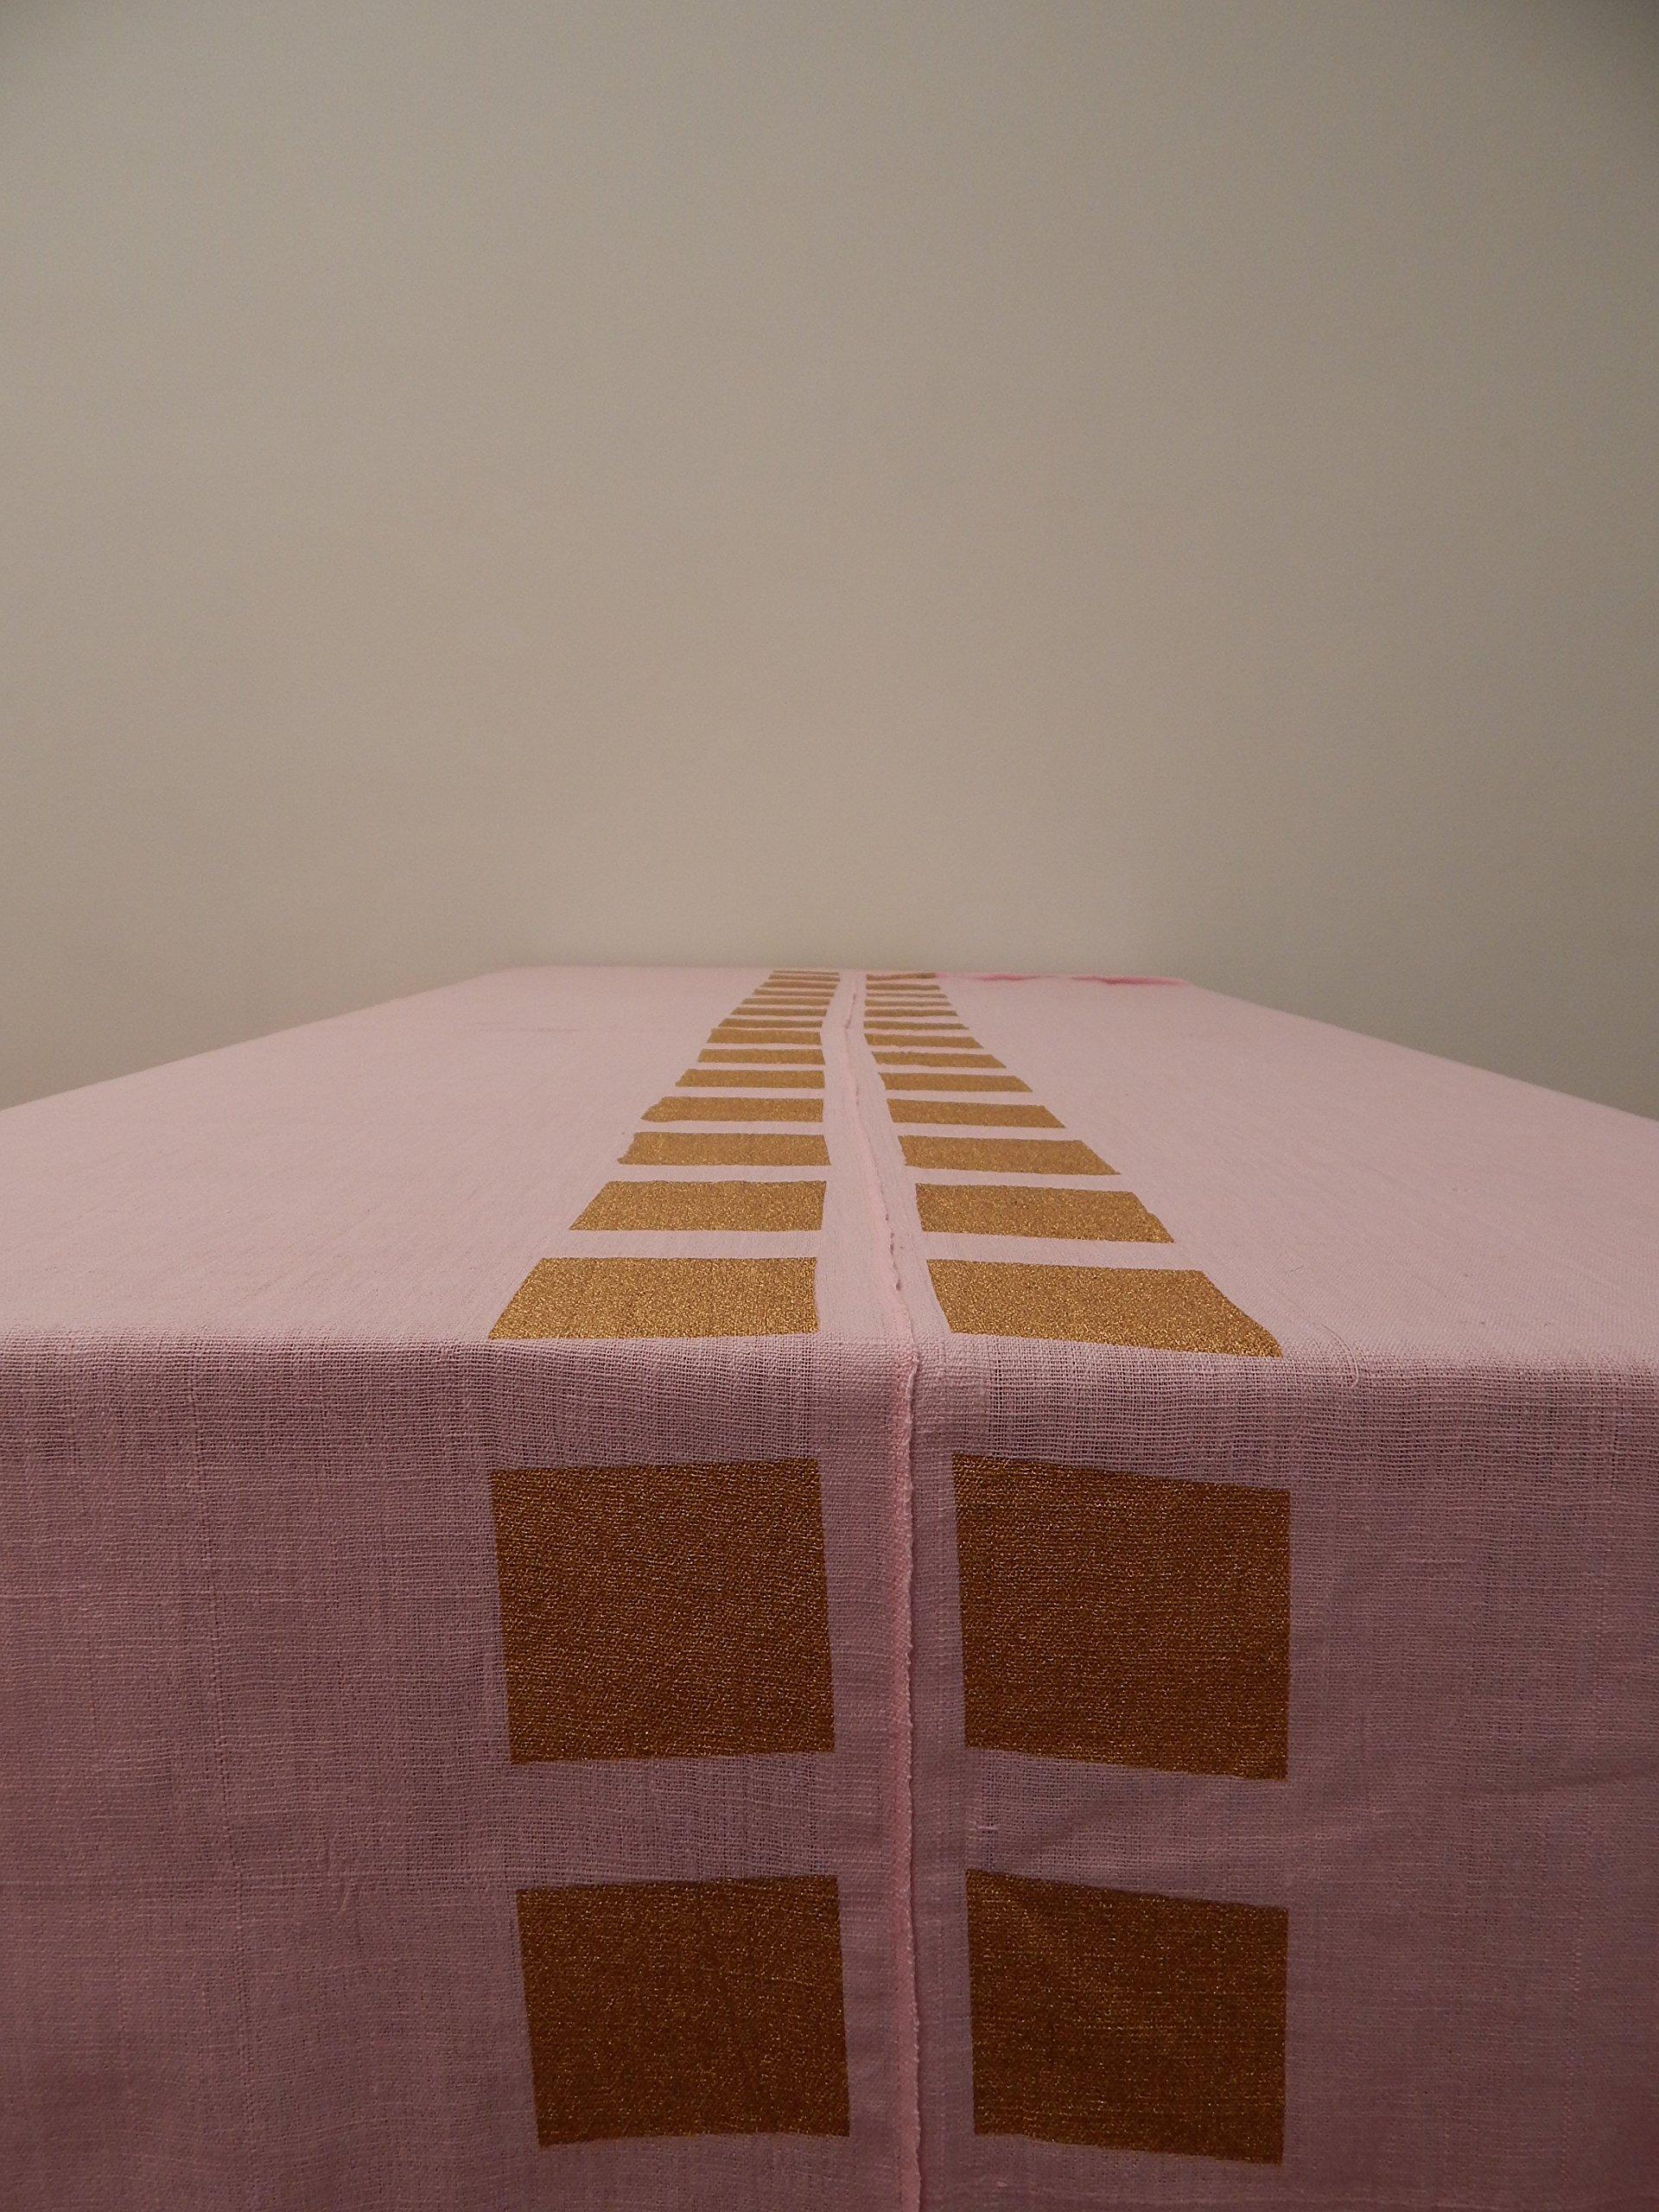 Gitika Goyal Home Cotton Khadi Gold Screen Printed Tablecloth with Square Design, Pink, 60'' x 90''